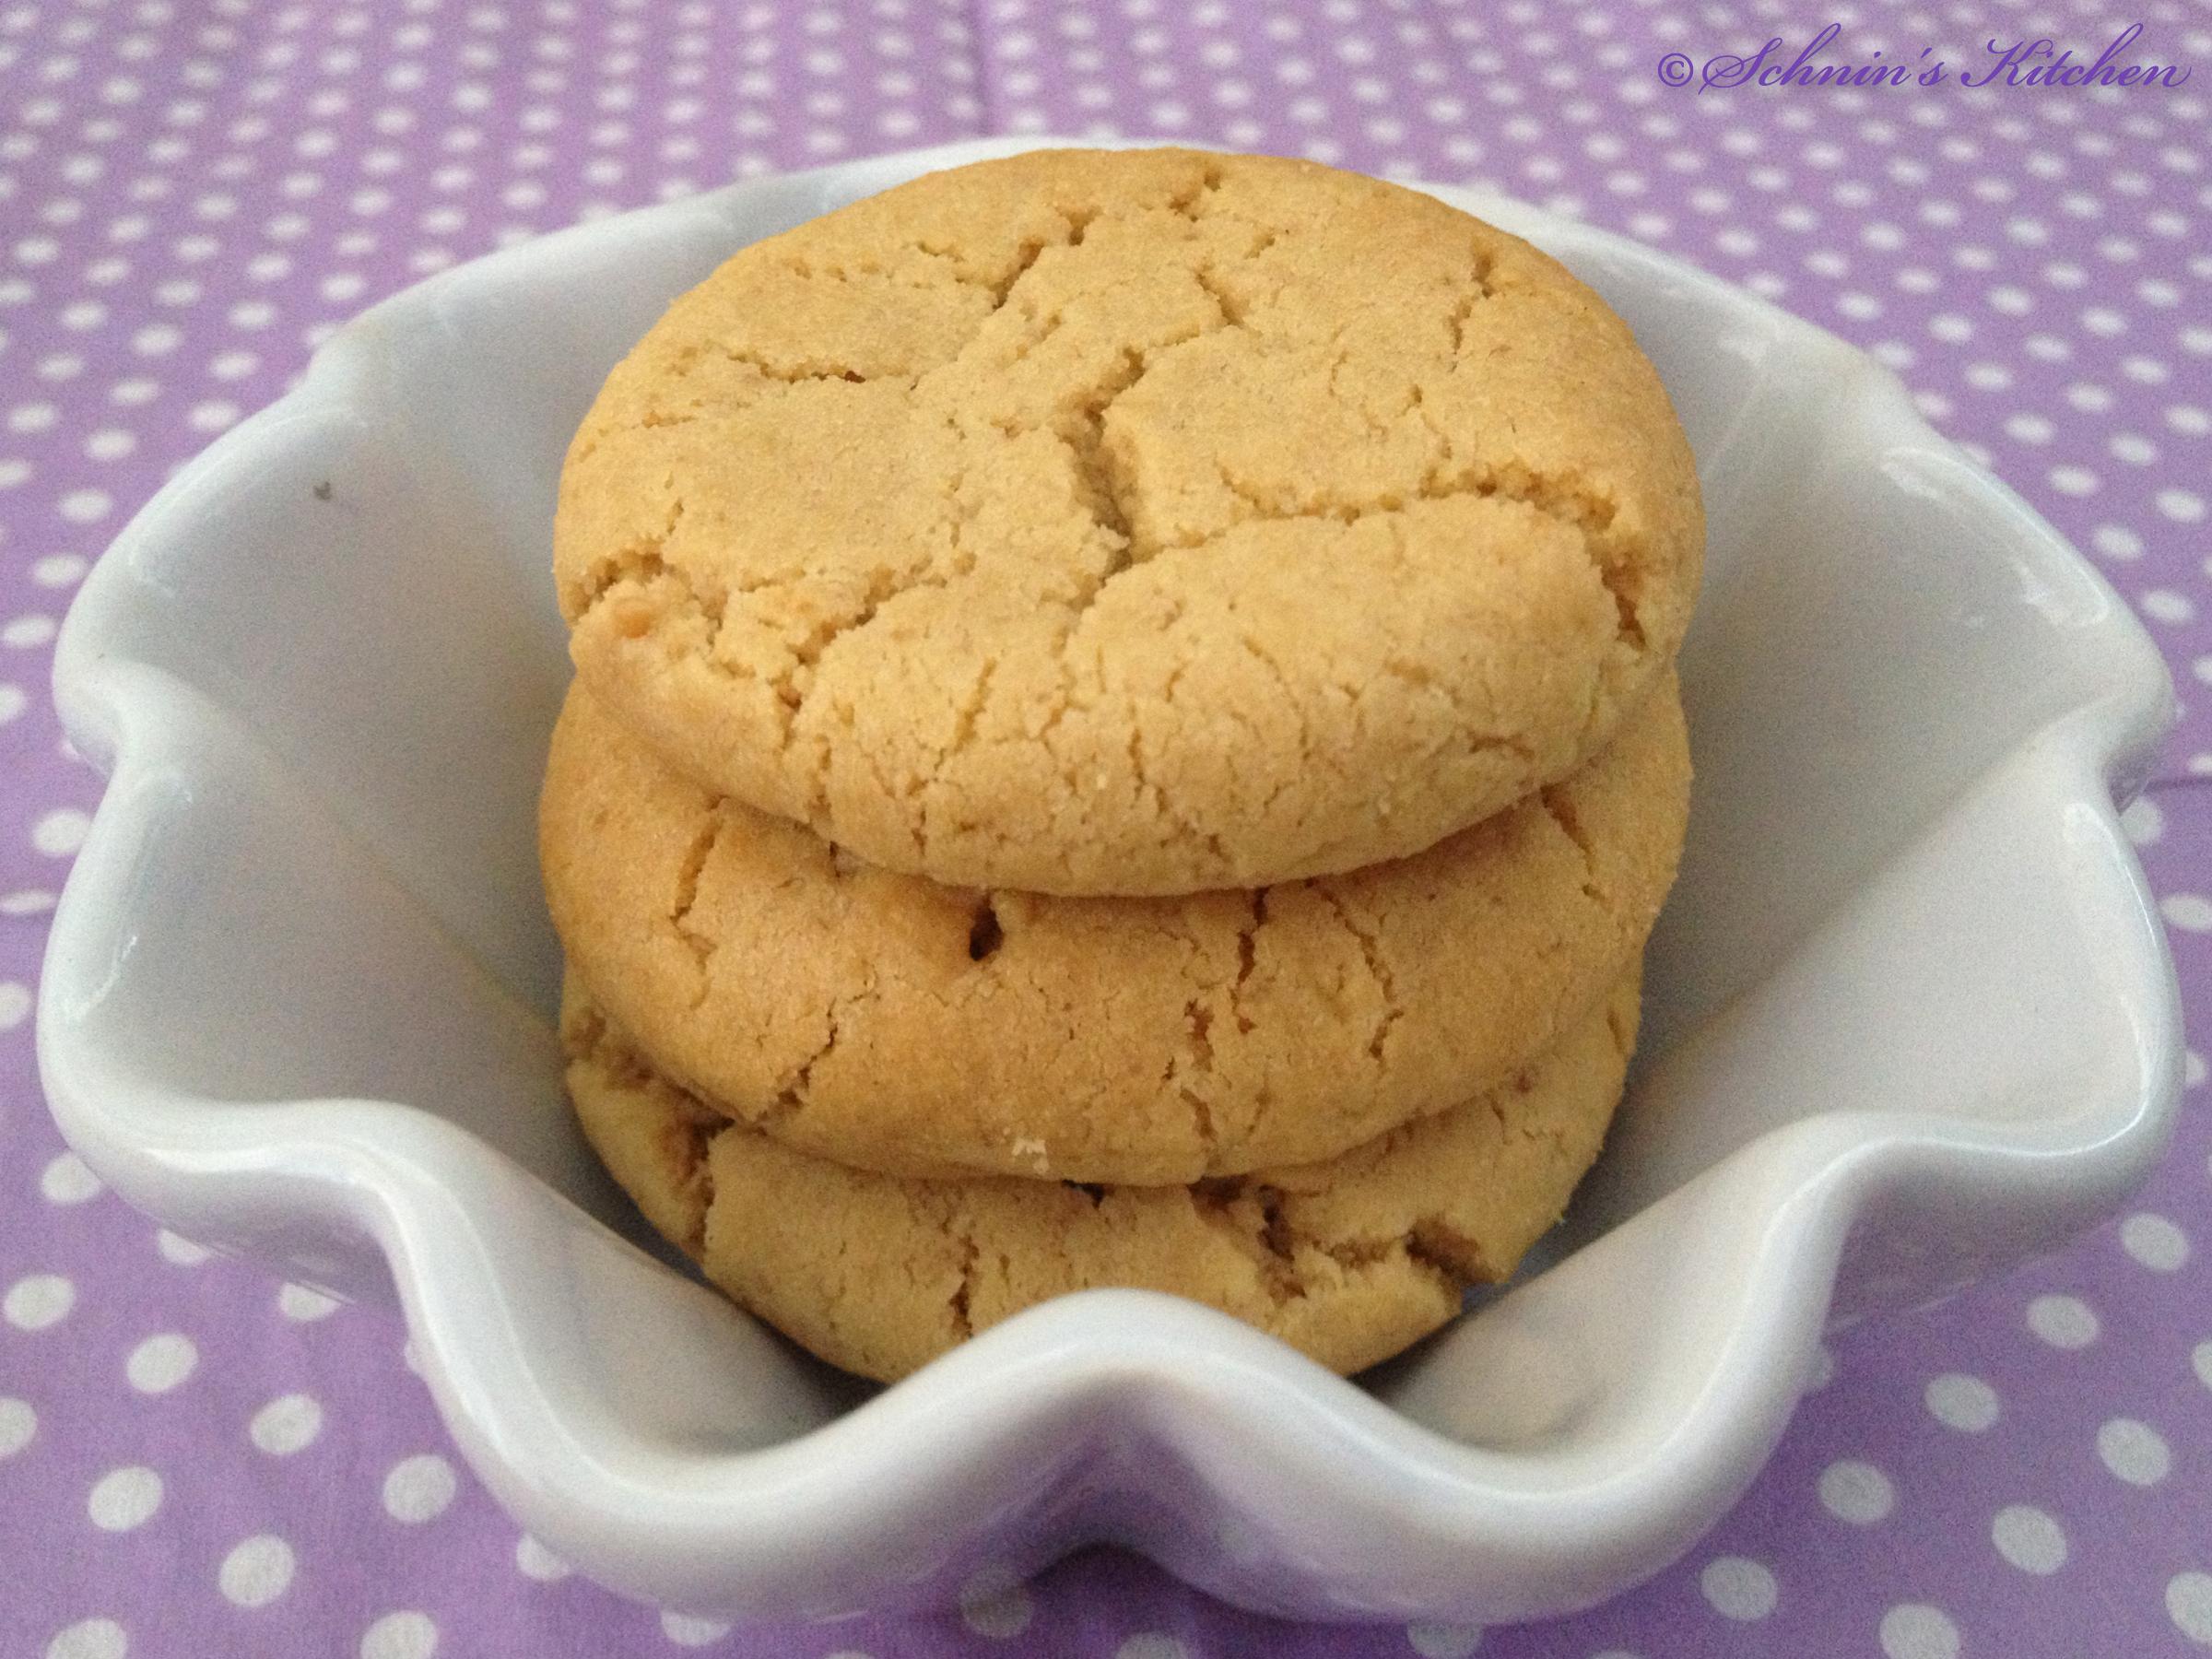 keks liebe erdnu butter cookies schnin 39 s kitchen. Black Bedroom Furniture Sets. Home Design Ideas